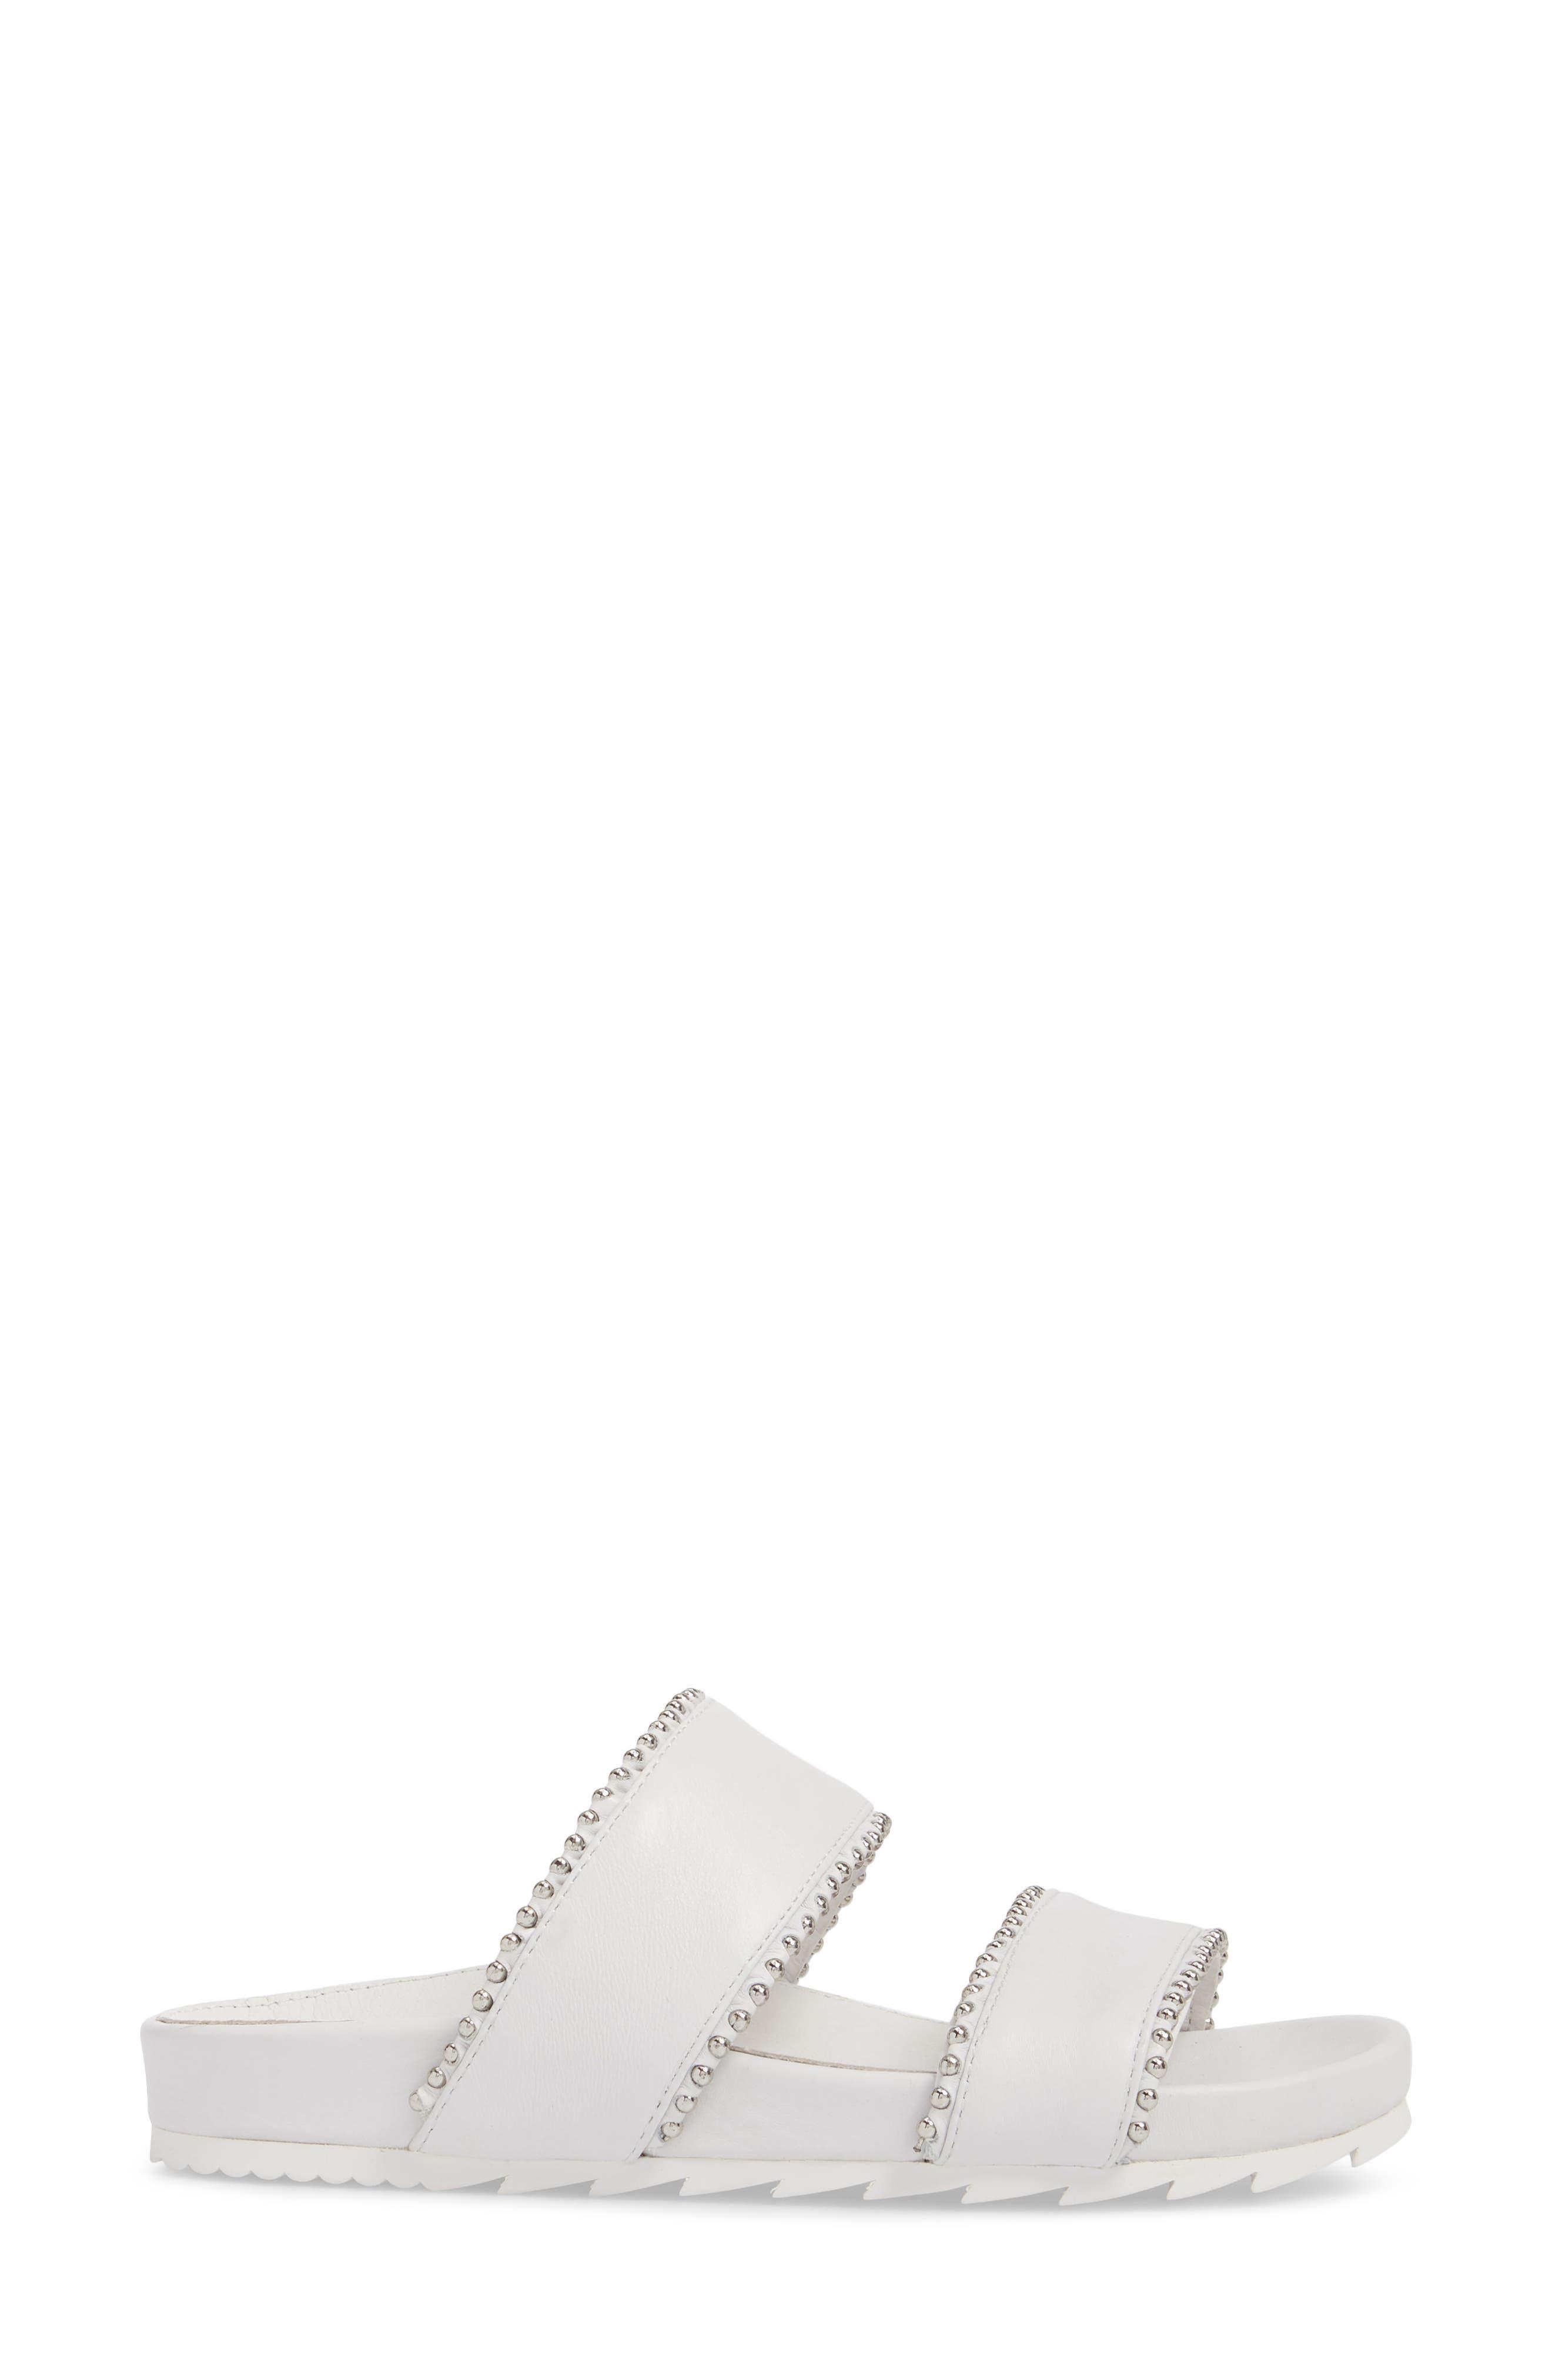 Emmie Bead Chain Slide Sandal,                             Alternate thumbnail 3, color,                             White Leather